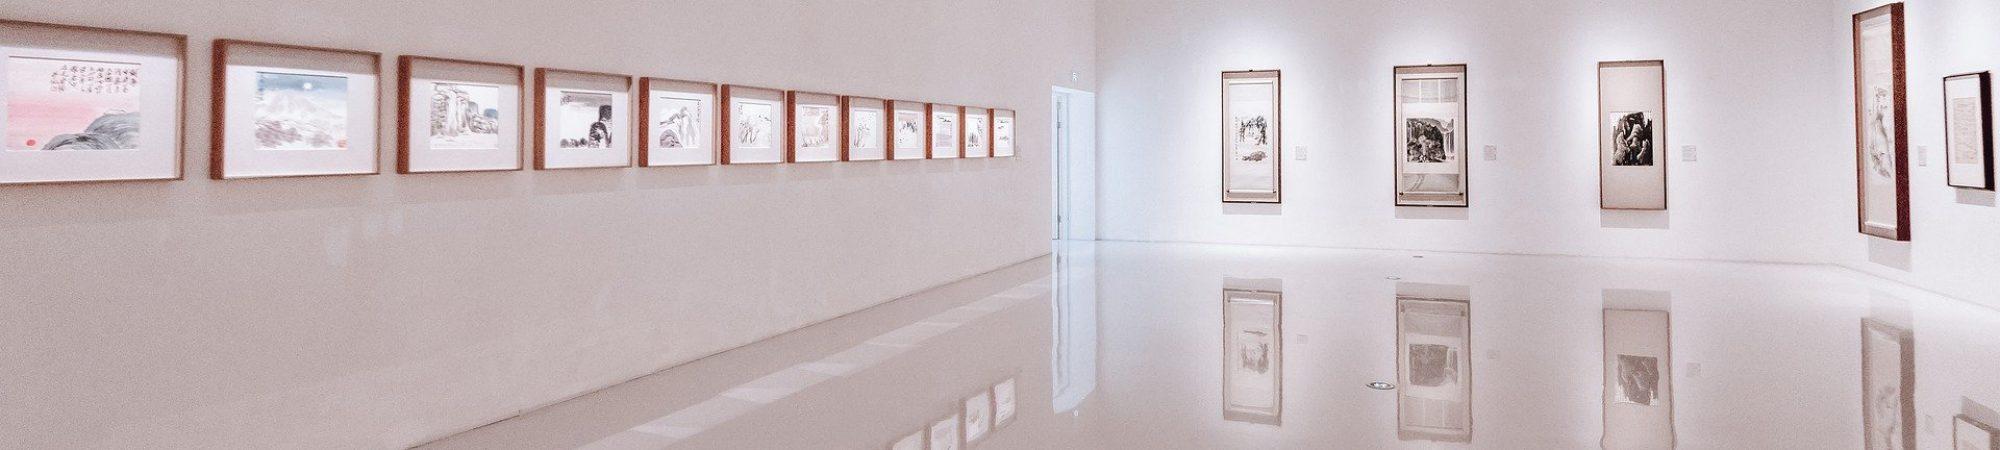 art-gallery-4674319_1920